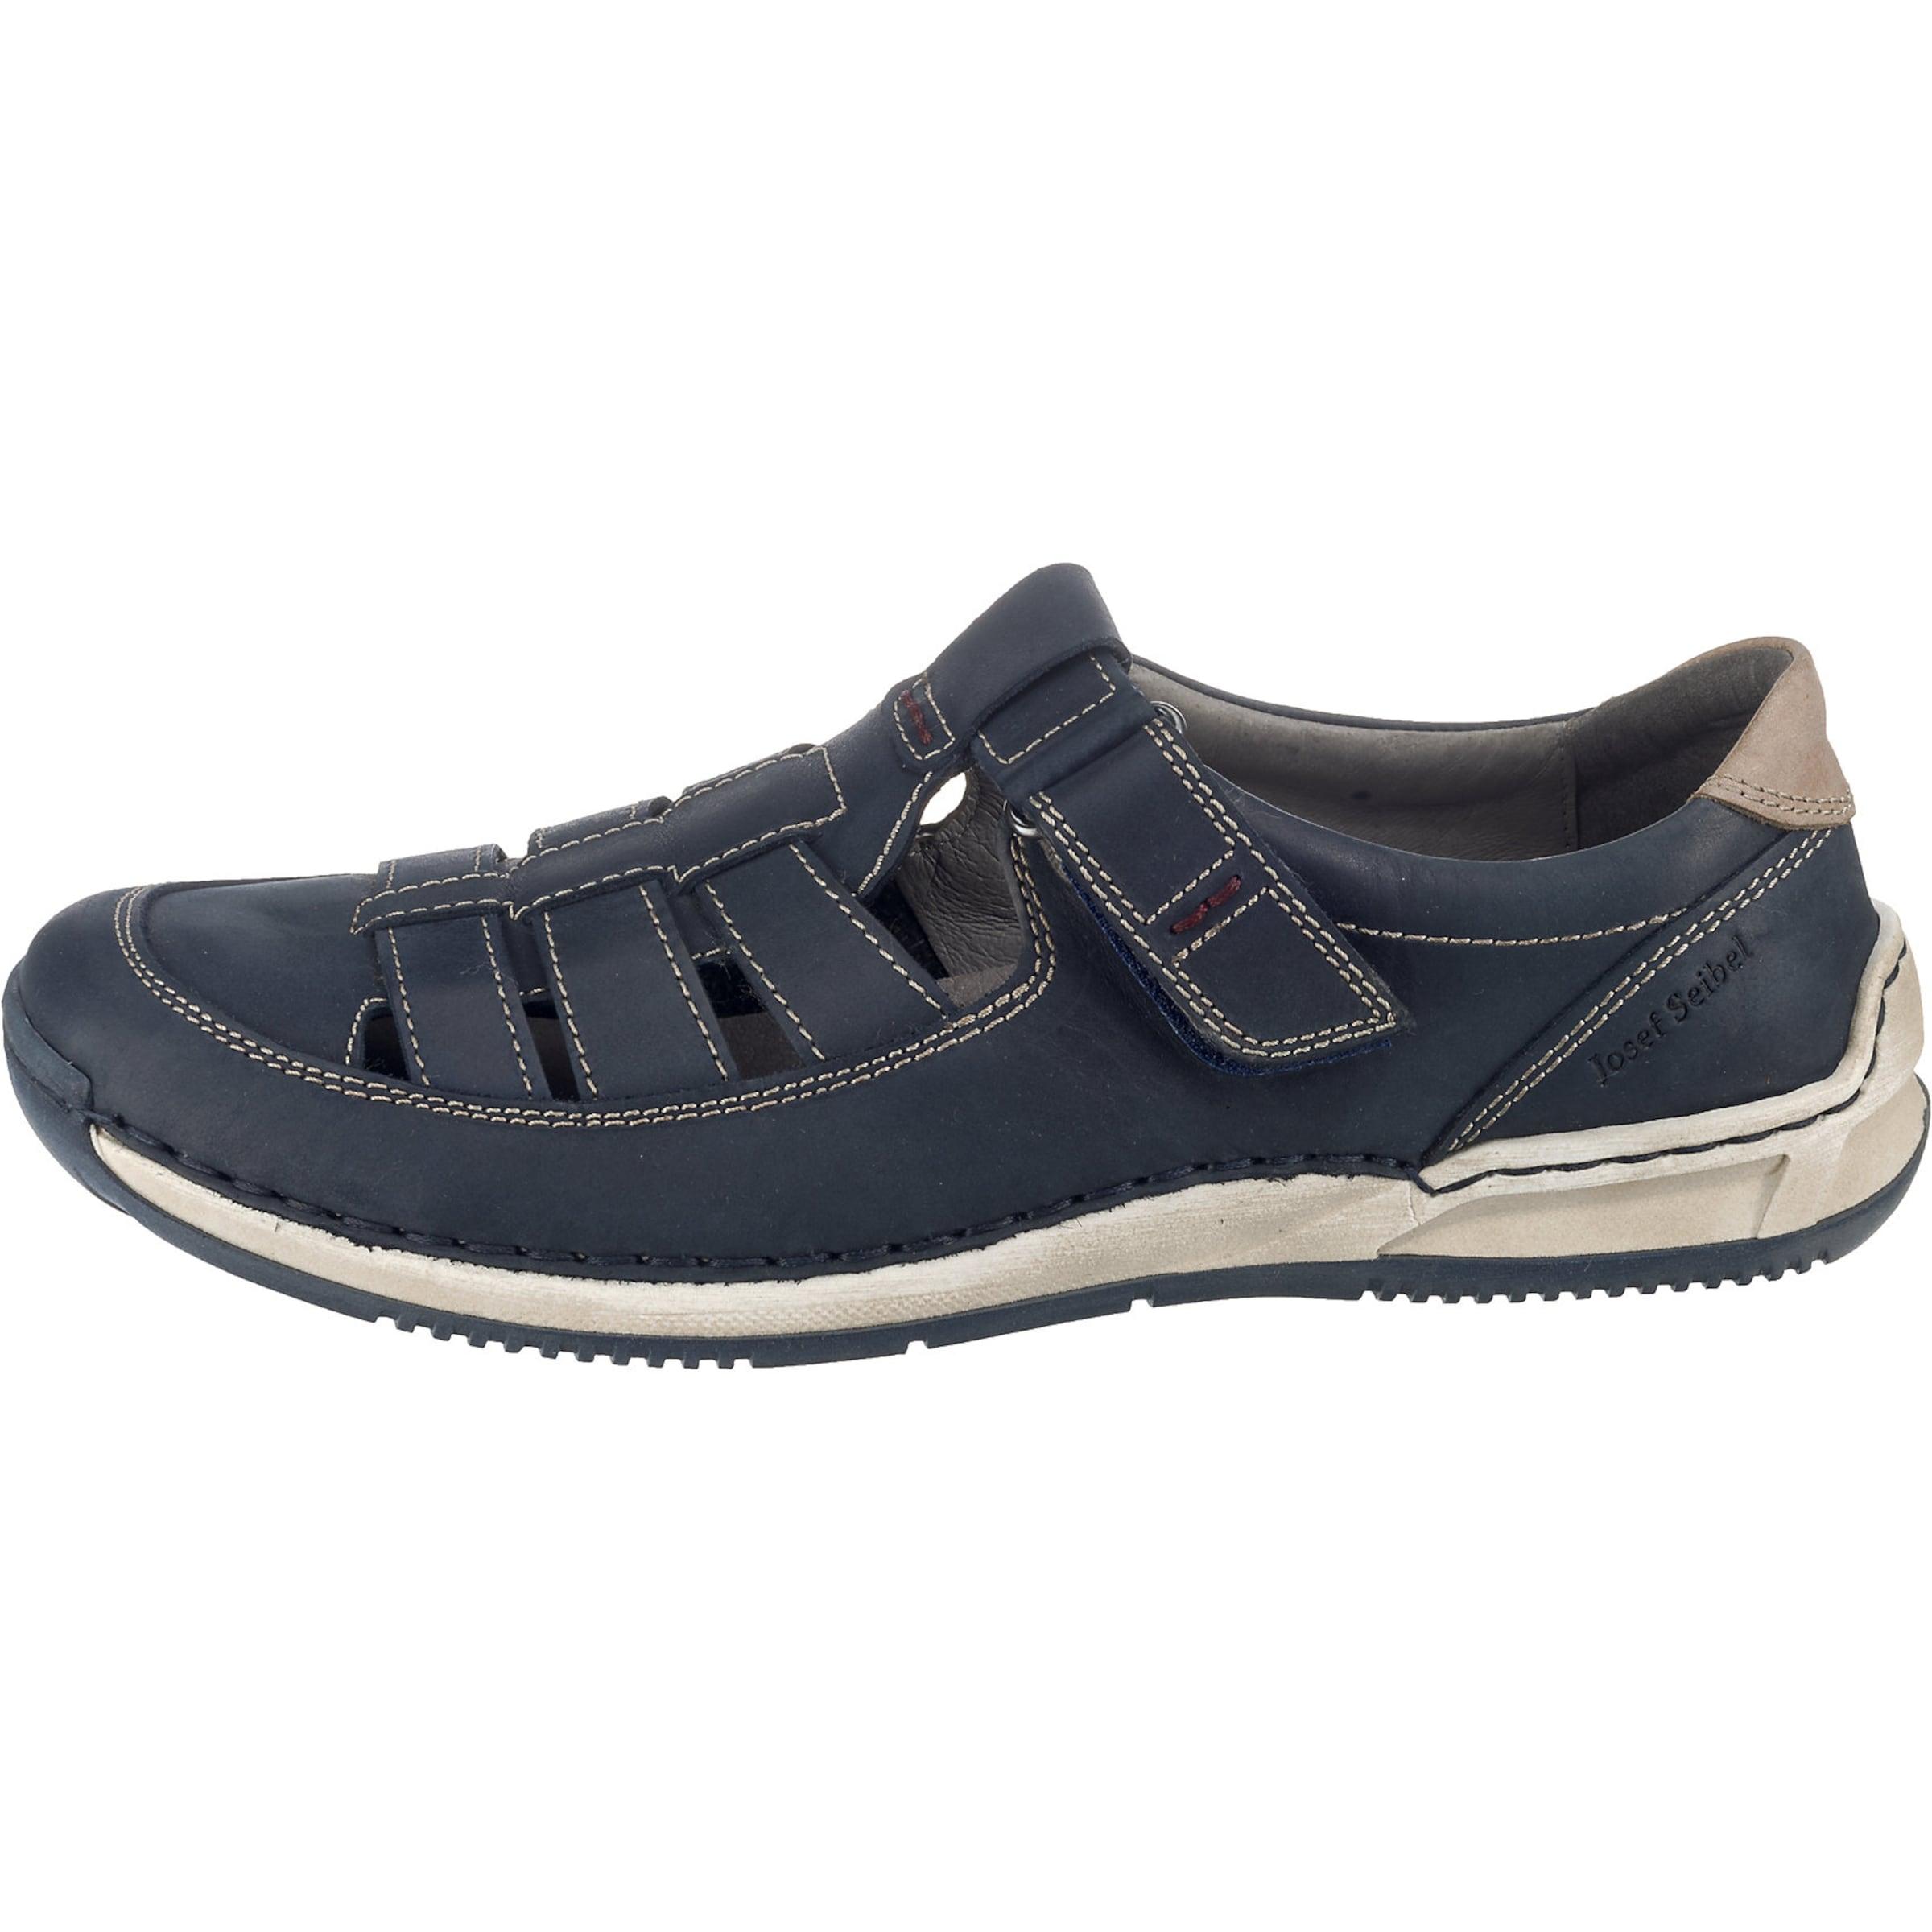 Seibel In Komfort sandalen Blau 13 Matthias Josef kuPXOiZ